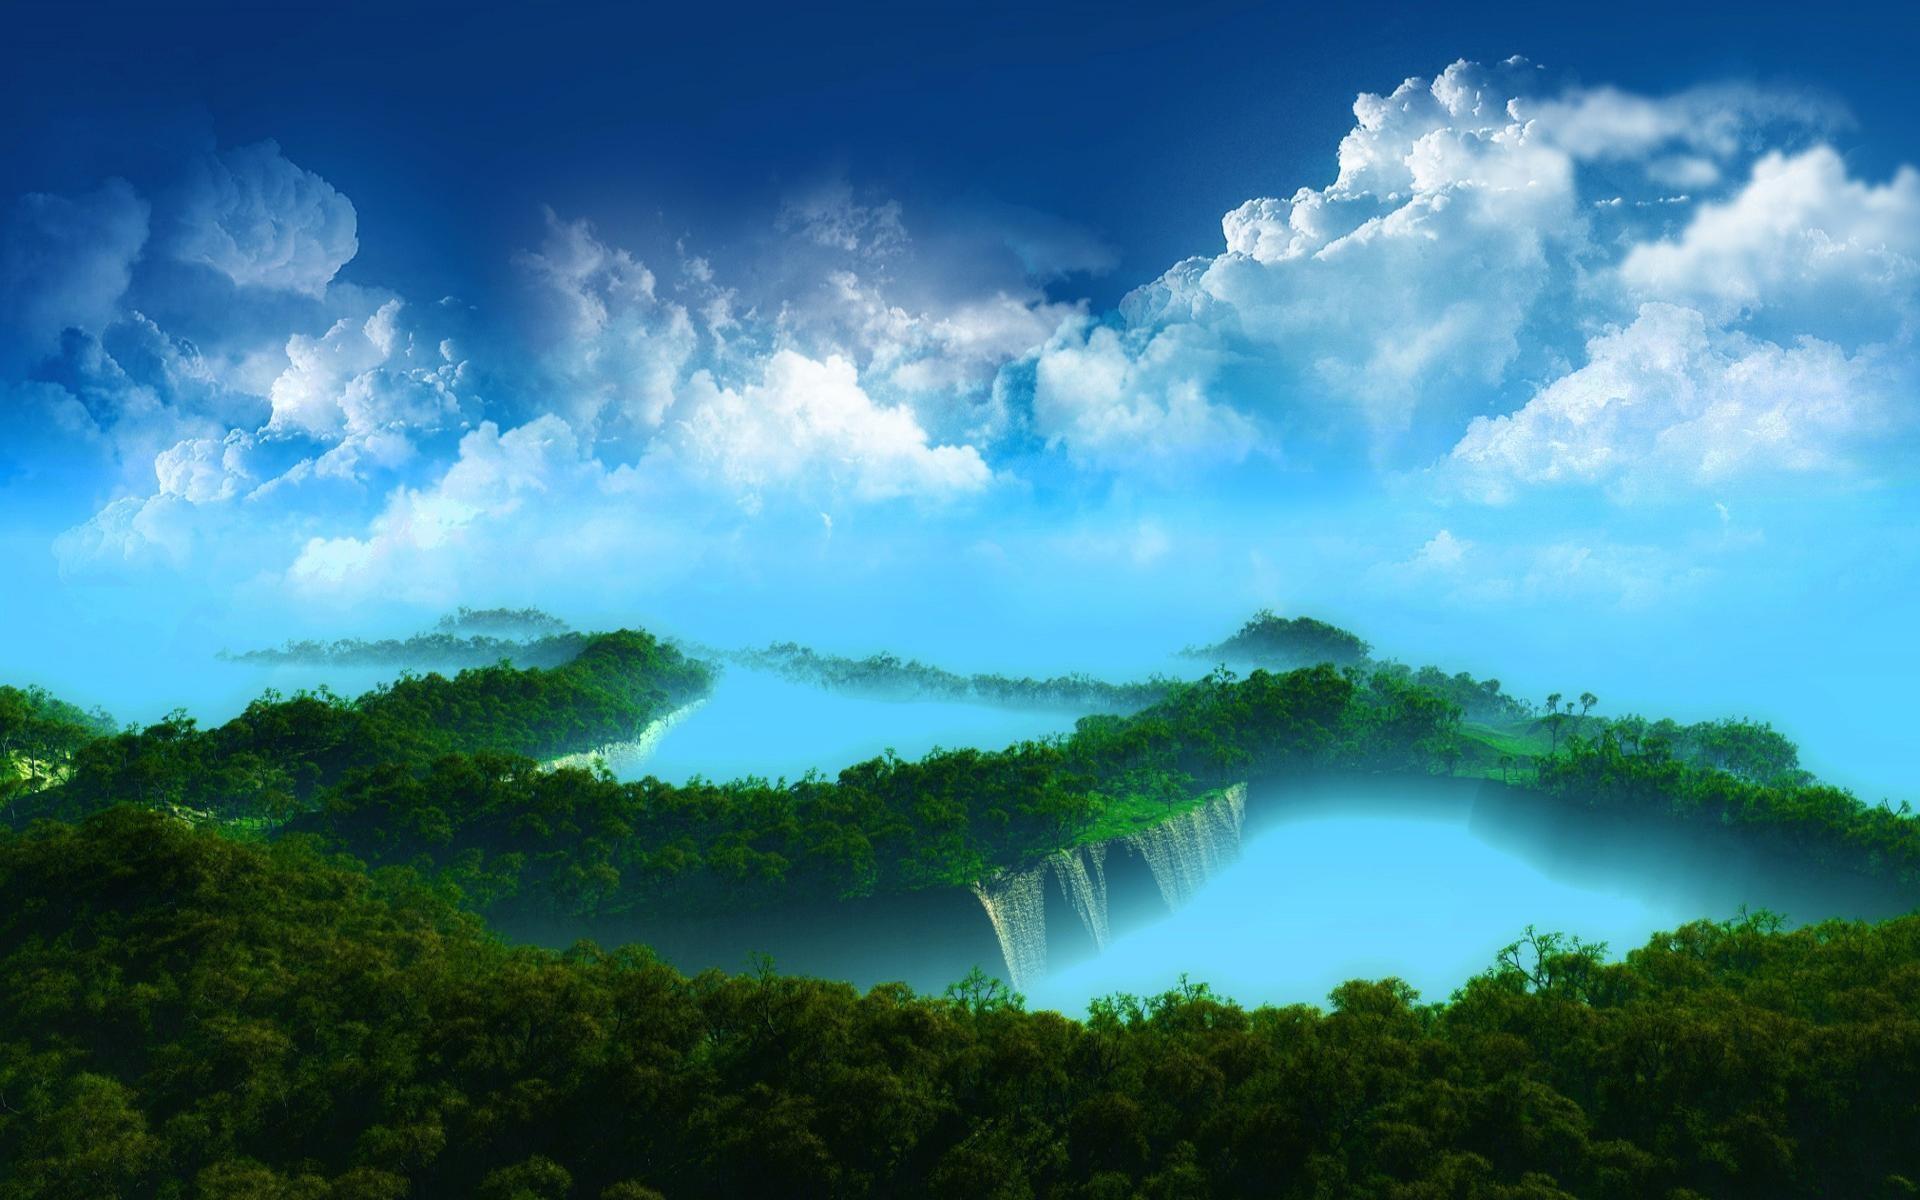 paradise images for desktop background – paradise category